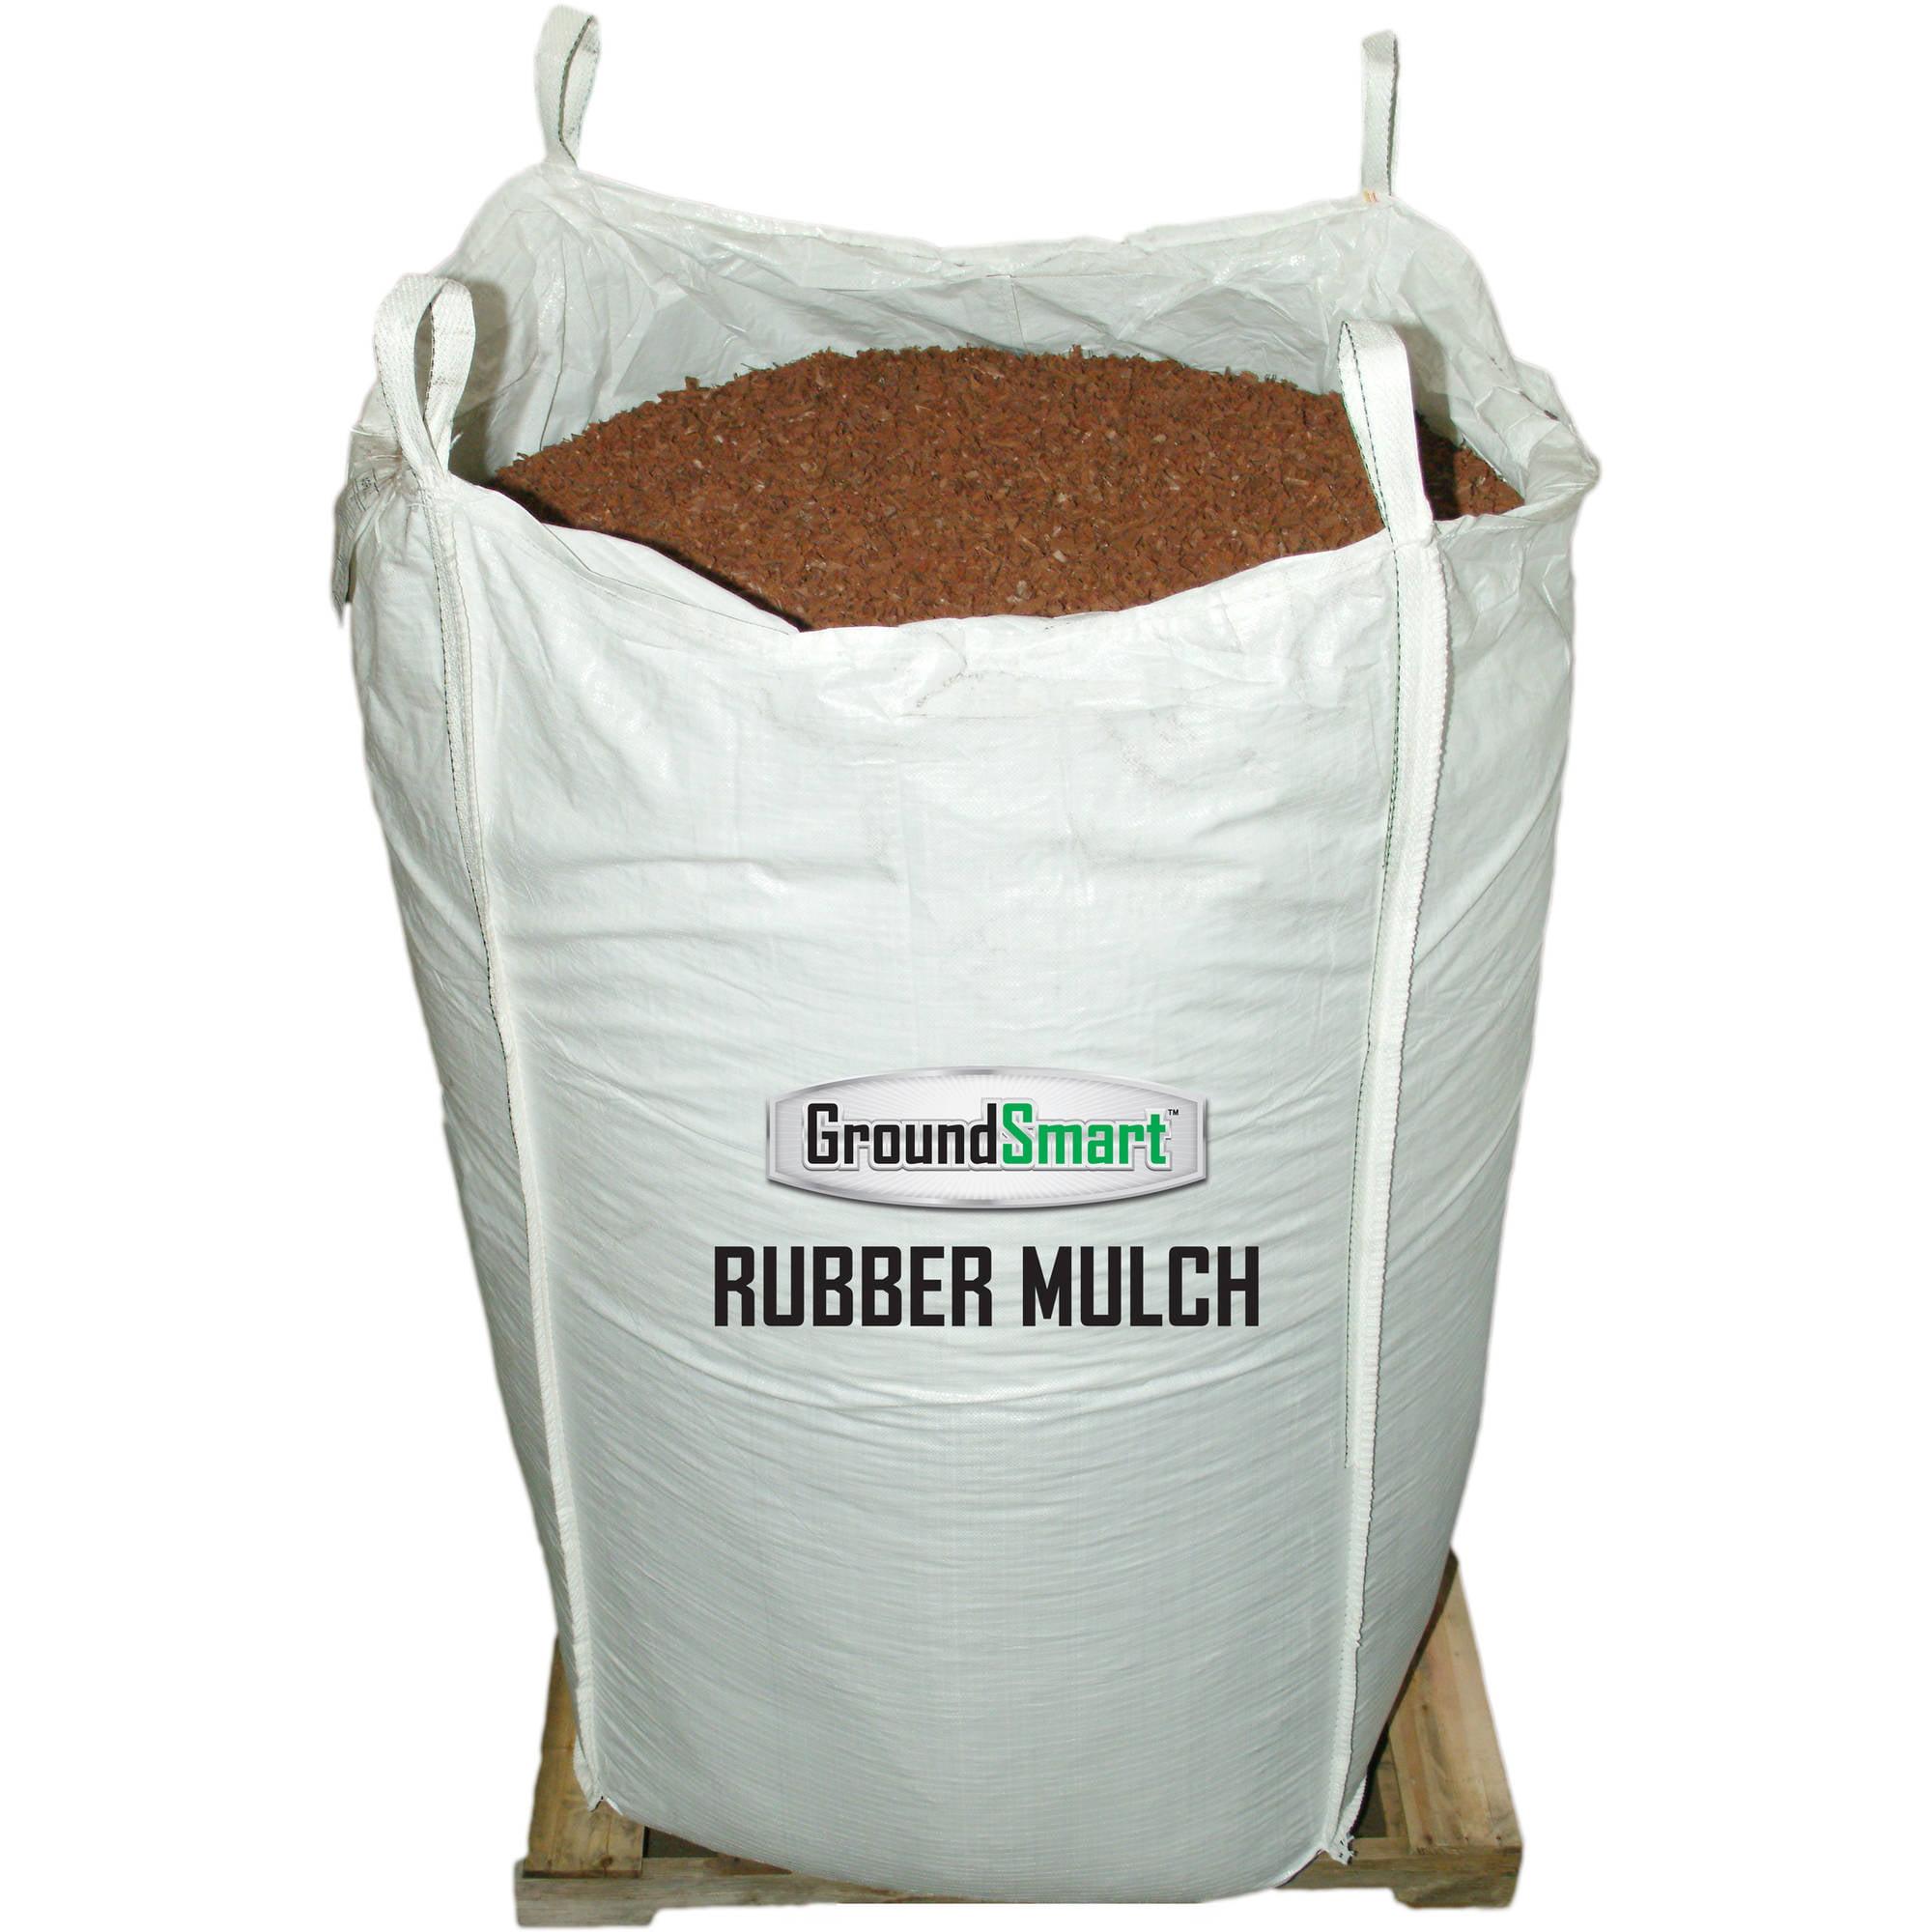 Groundsmart Mocha Brown Rubber Mulch 76 9 Cu Ft Super Sack Walmart Com Walmart Com